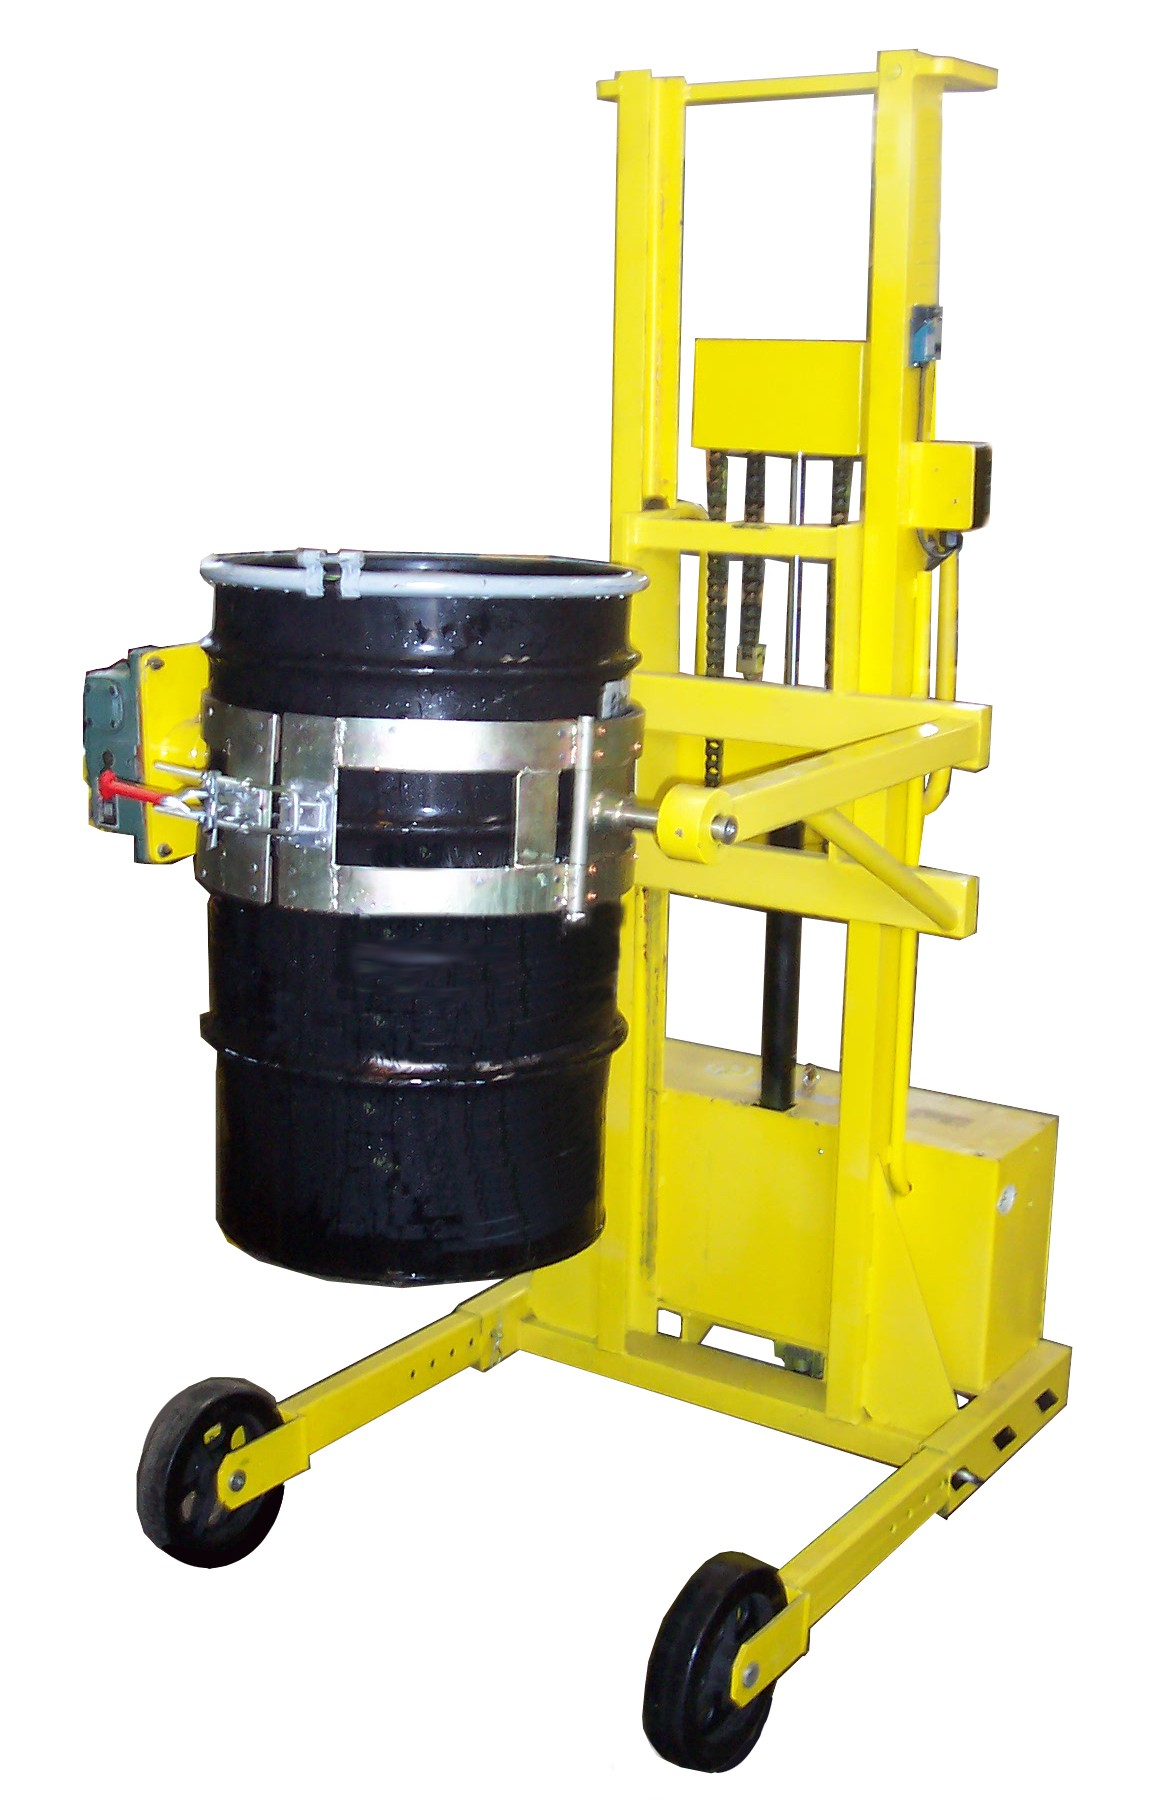 TD-850-PL Drumvertor Image